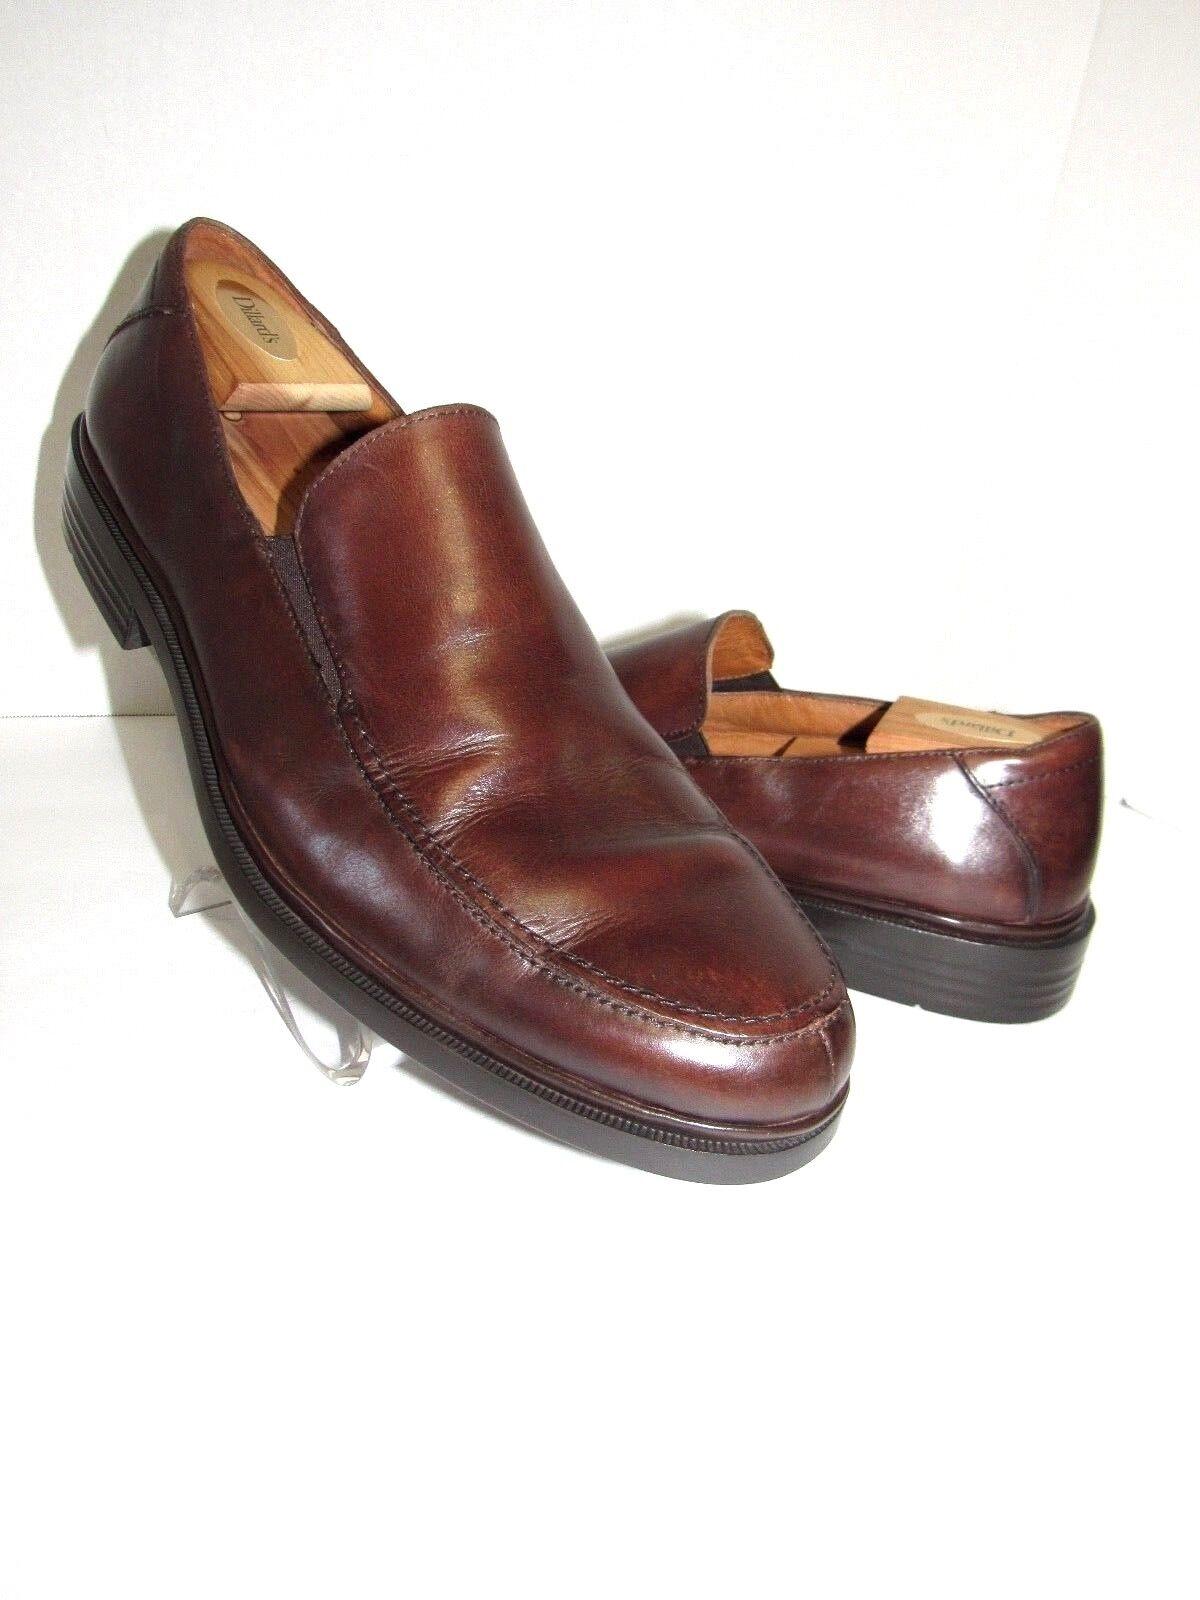 FLORSHEIM Comportech marrone Pelle Loafers Scarpe SZ 12 D